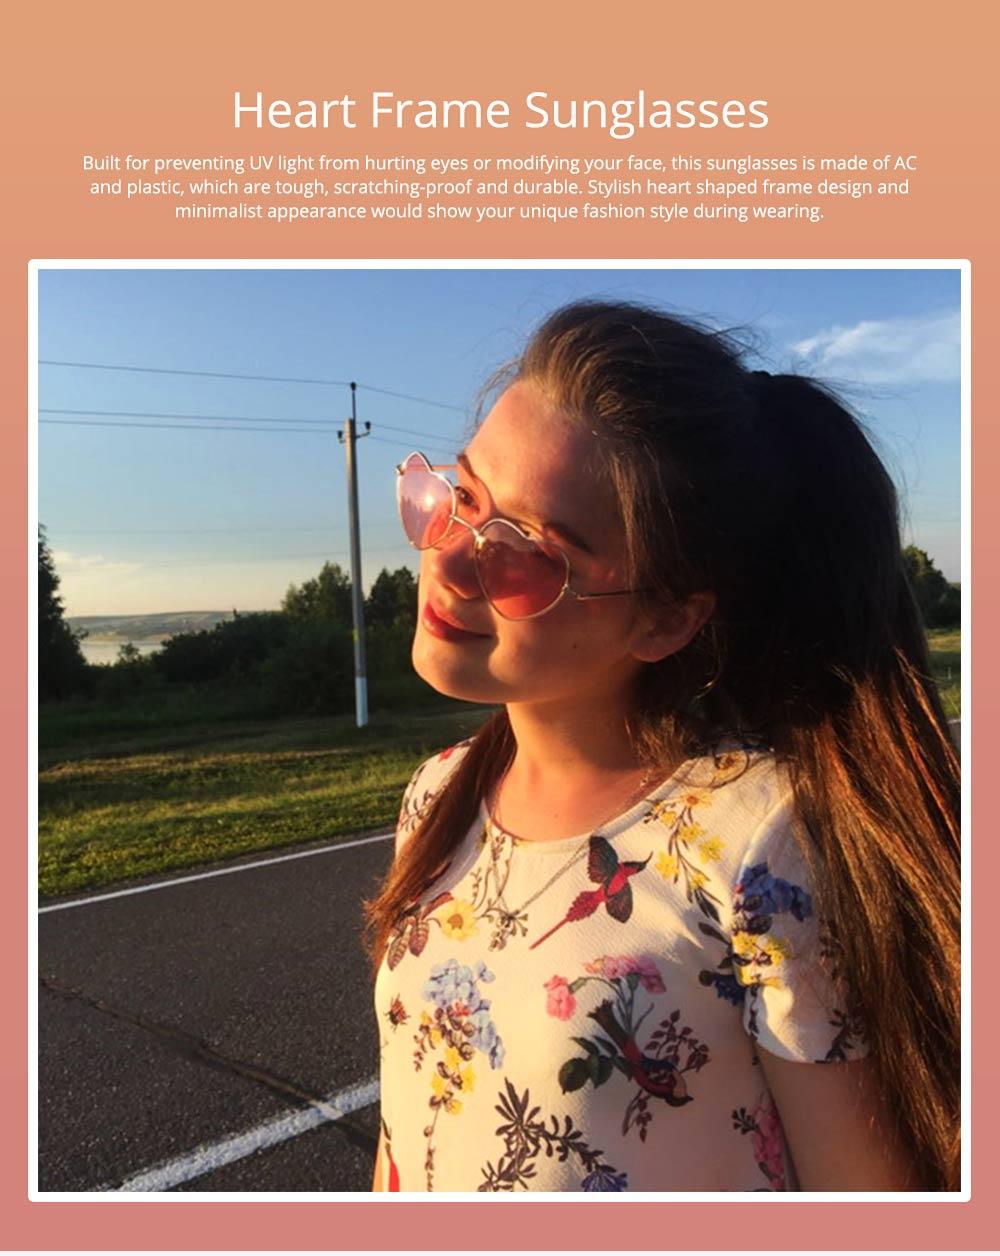 Minimalist Stylish Heart Shape Frame Unisex Sunglasses, Sun UV Protection Outdoors Decoration Dress Up Sunglasses for Ladies 0